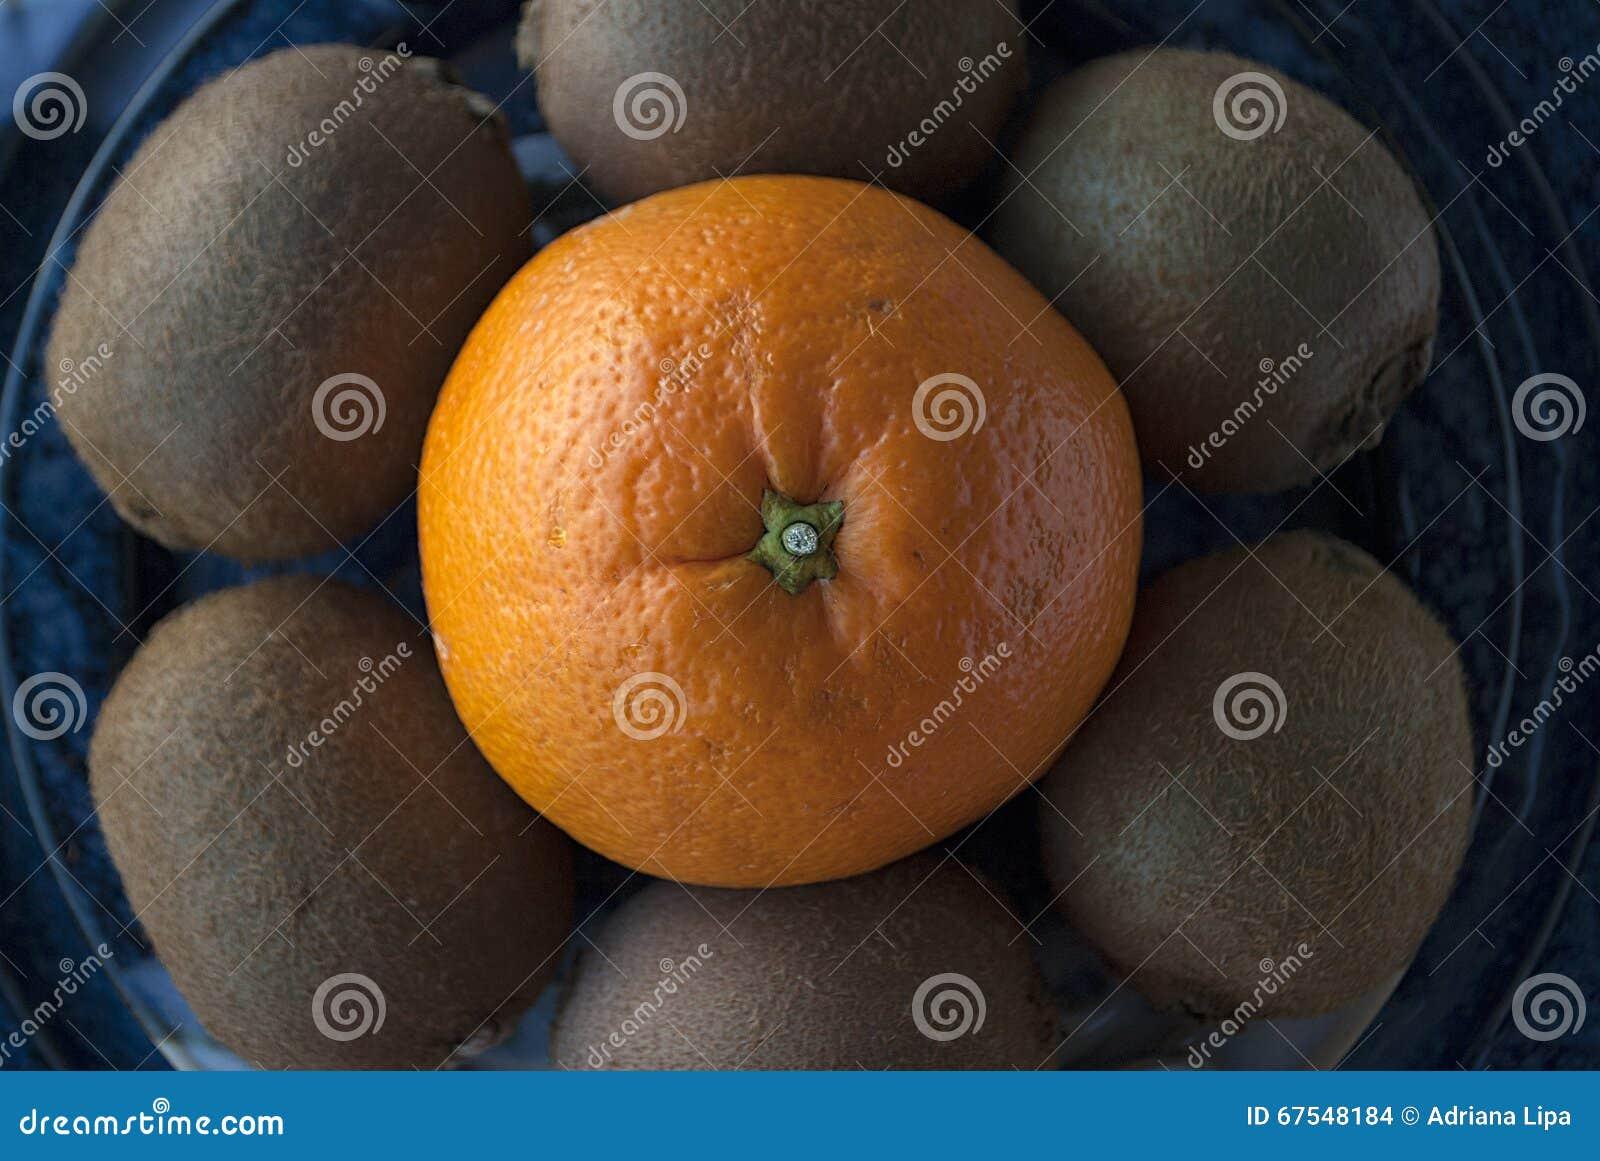 Macro shot of an orange surrounded by kiwis